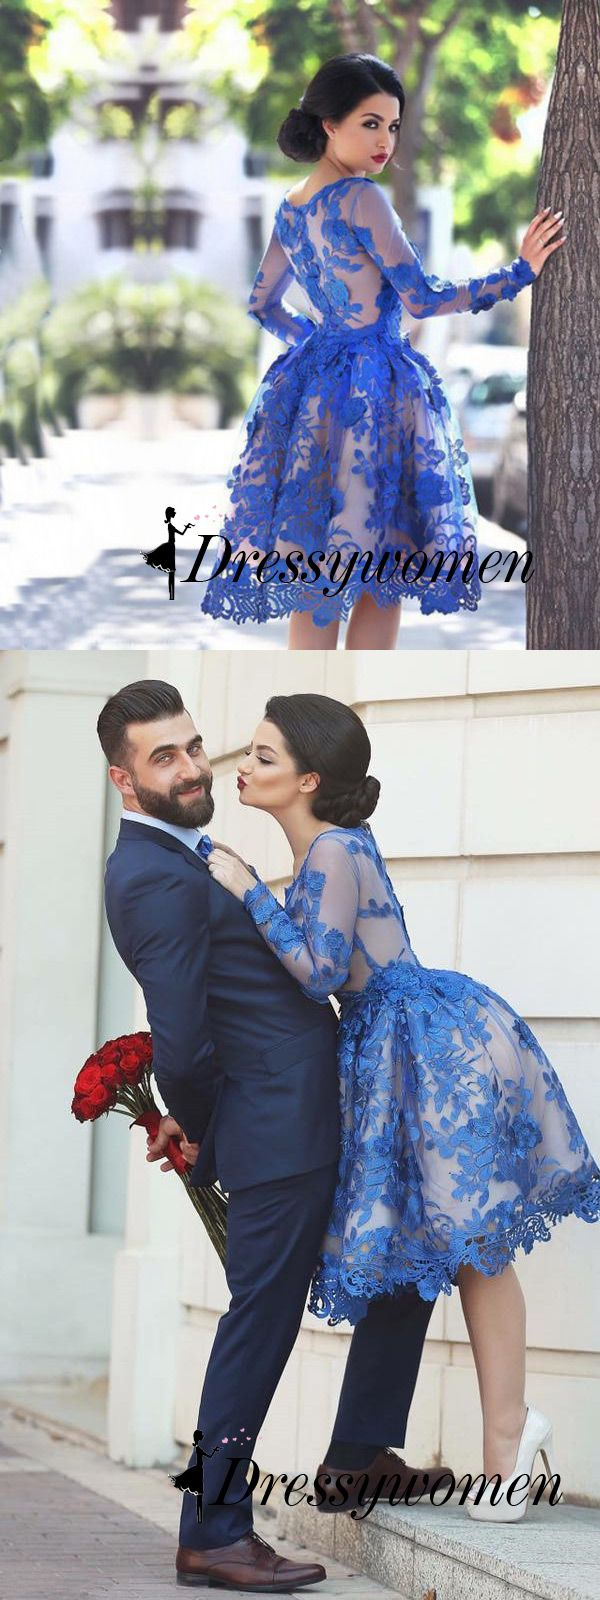 Vintage Prom Dress, Royal Blue Lace Wedding Dress, Knee Length Prom Dress, Prom Dress  with Long Sleeves